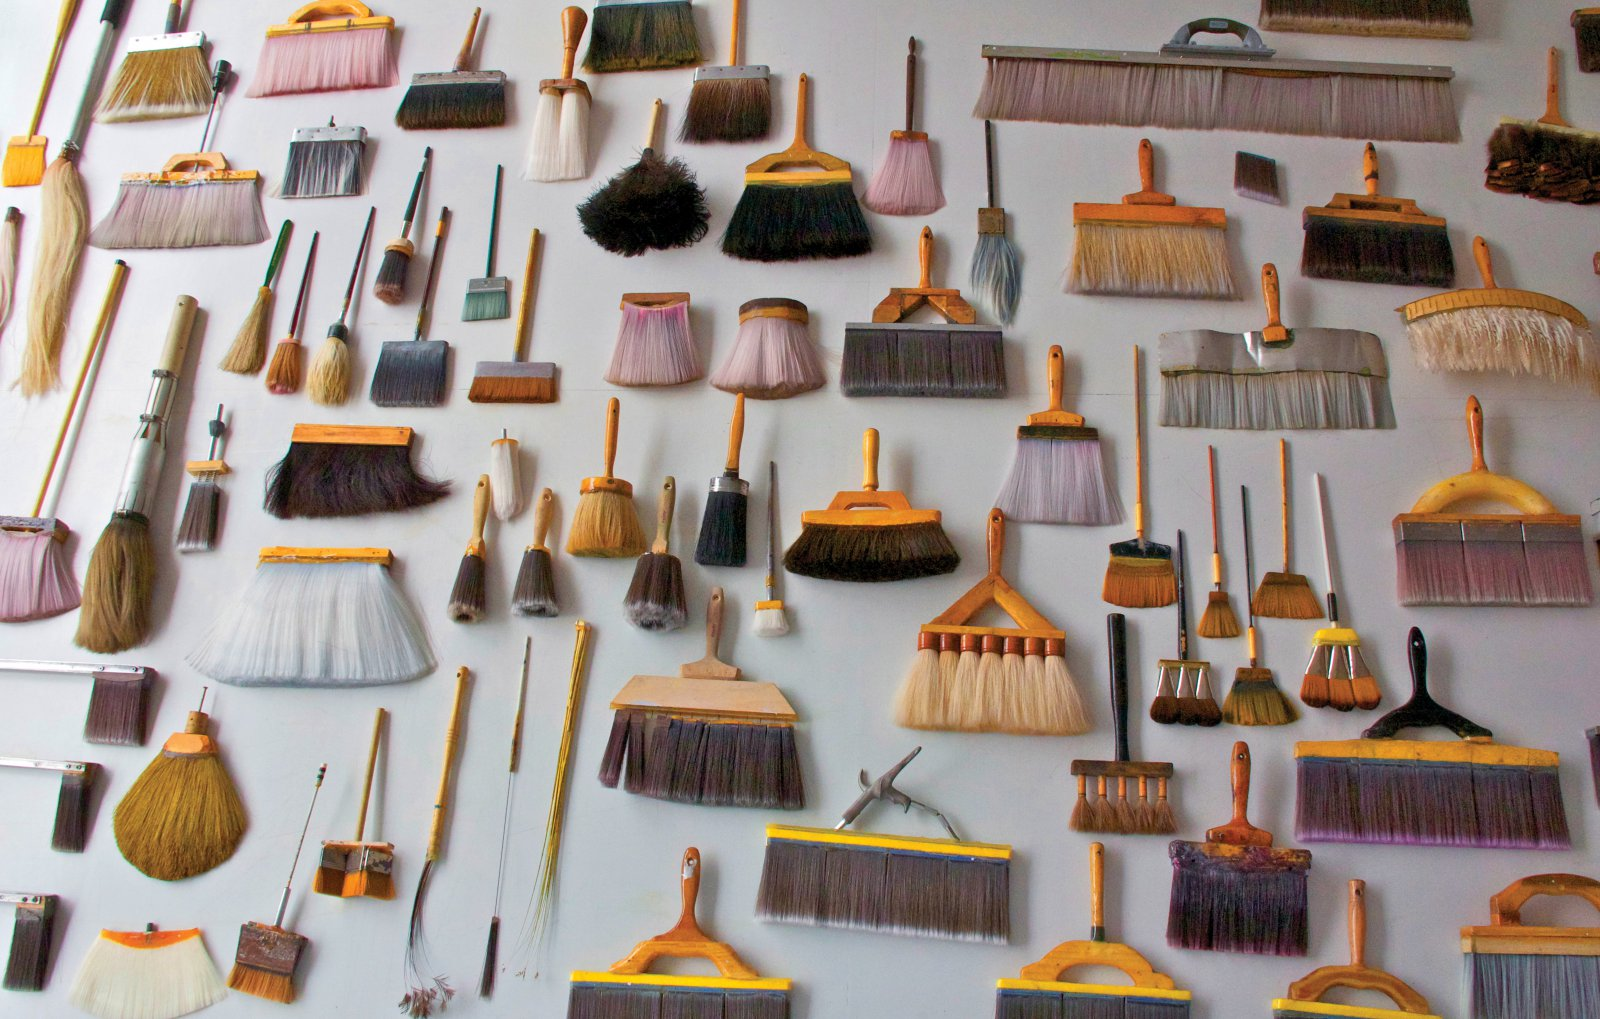 James Nares, Brushes, varying year, materials, dimensions